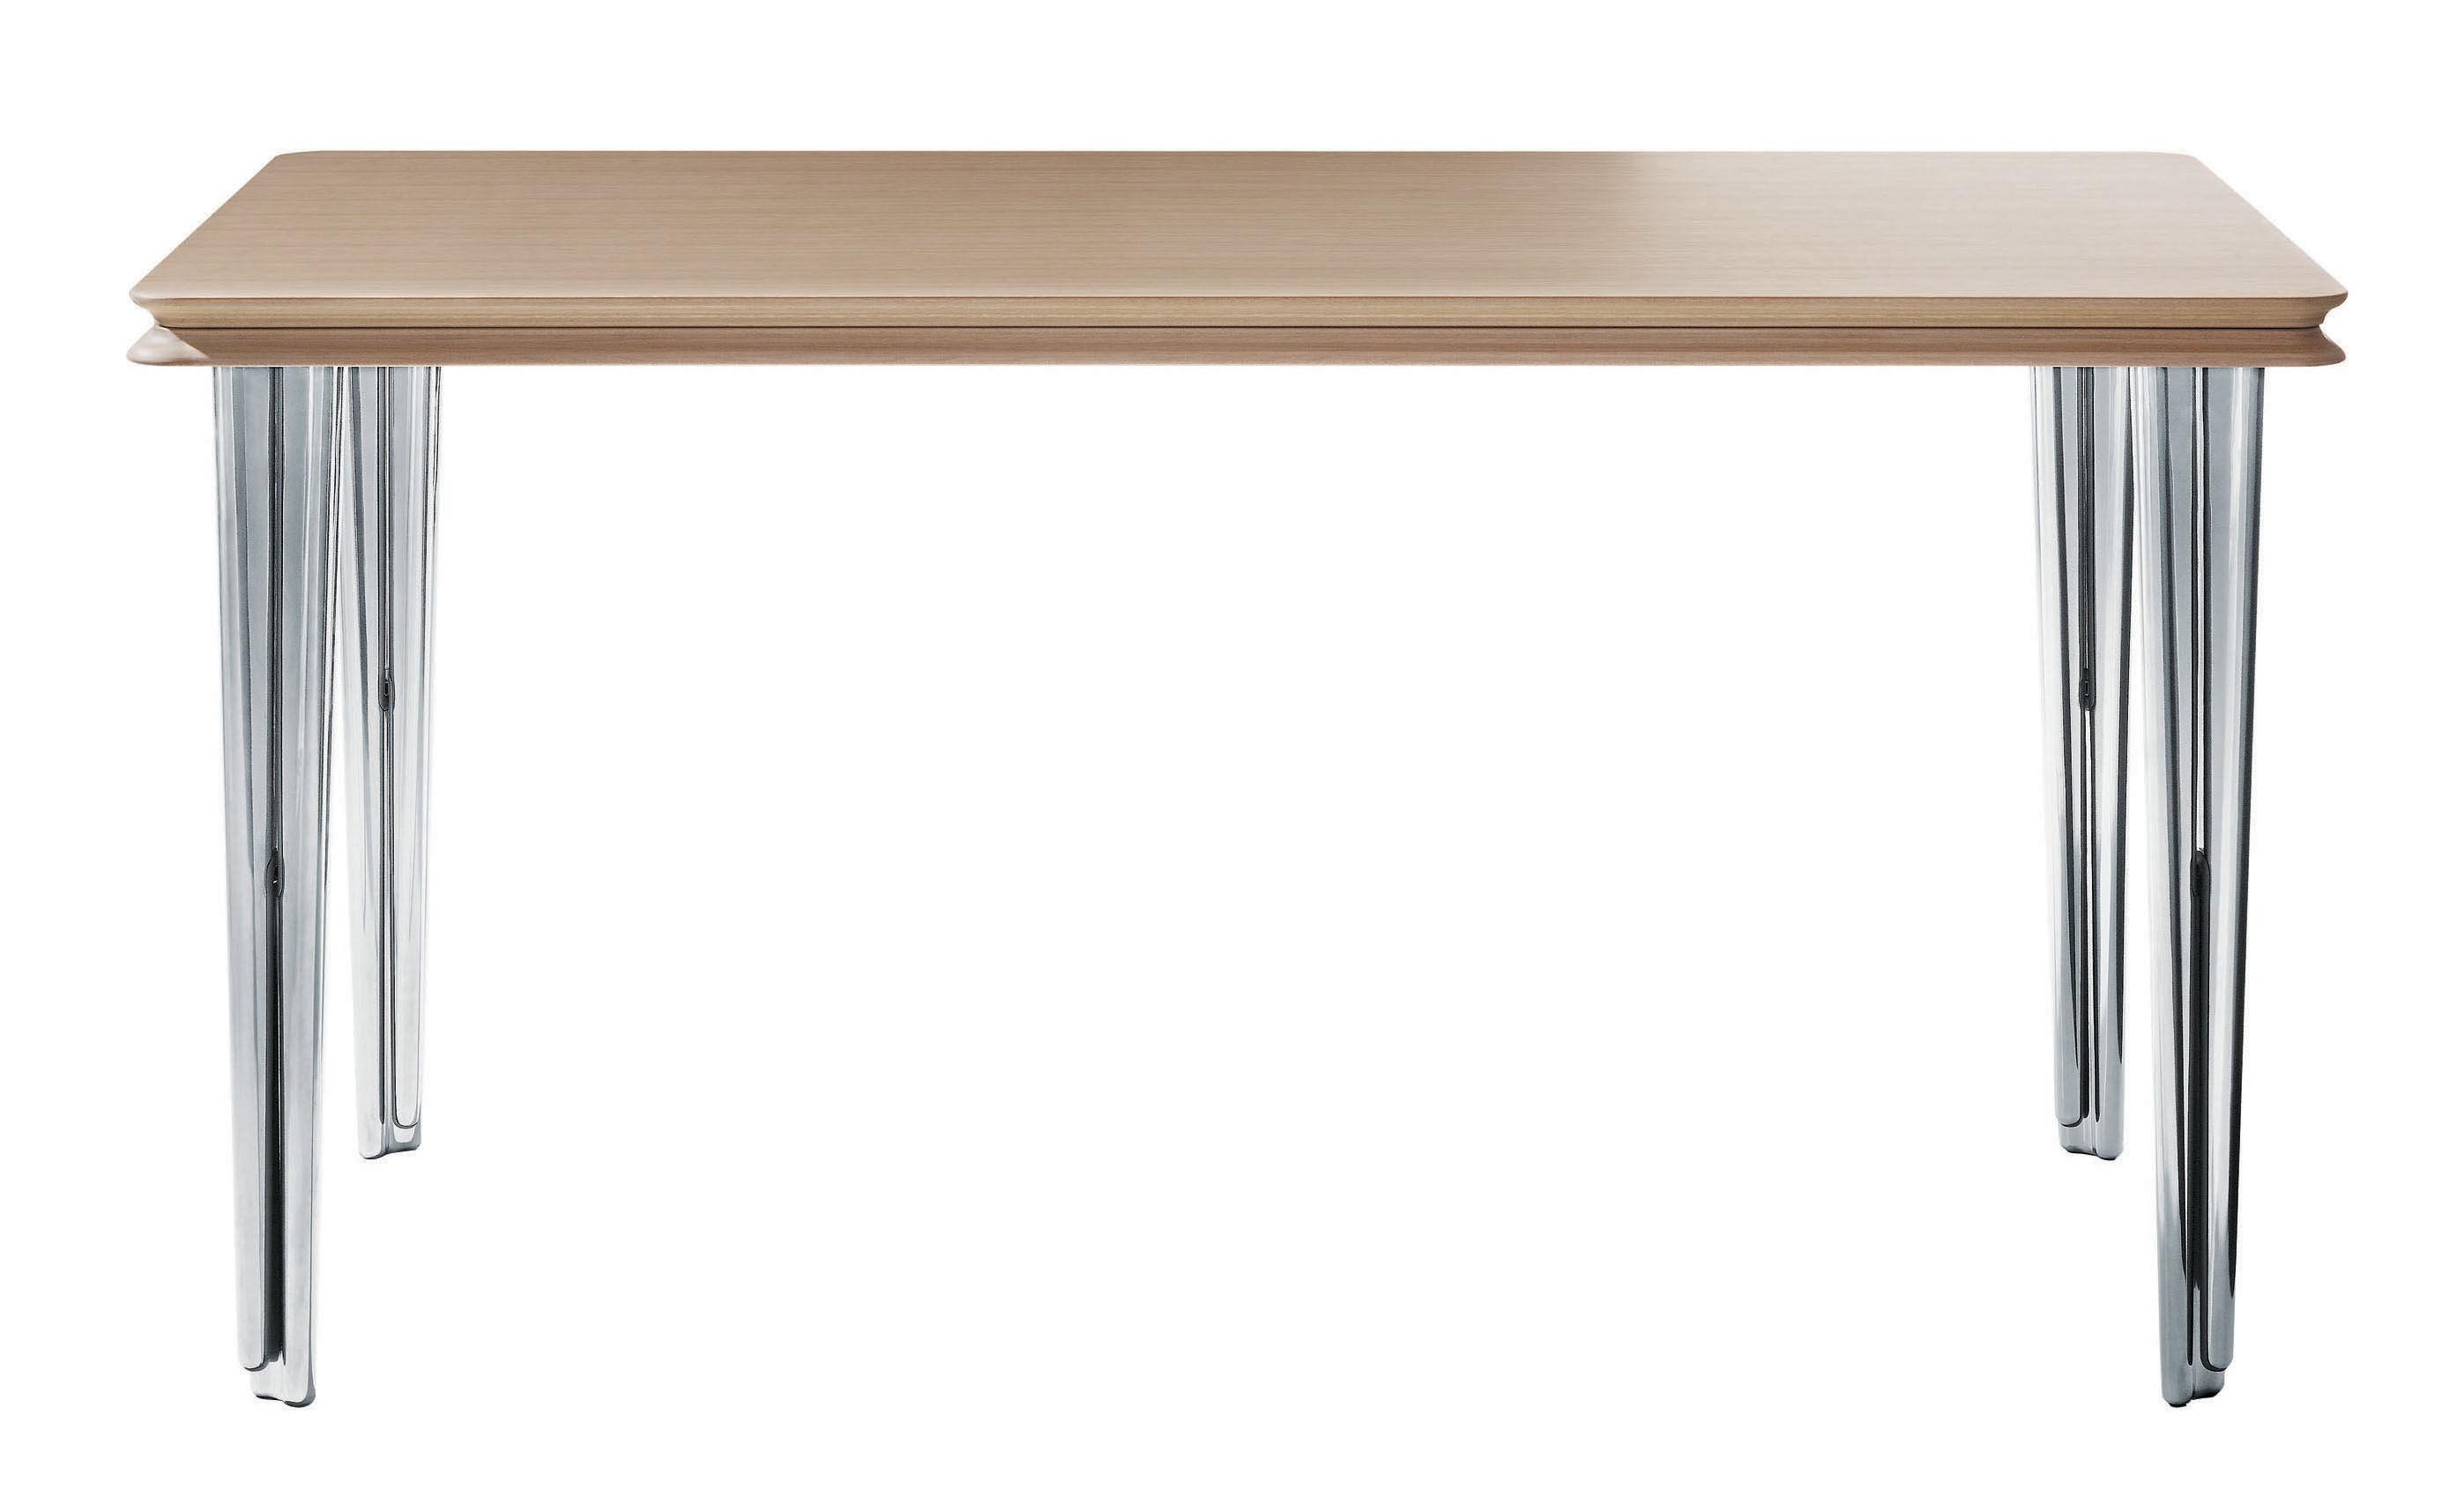 Mobilier - Mobilier Ados - Table à rallonge Piggyback / Set 2 tables empilables - Magis - Plateau chêne / pieds alu poli - Chêne, Fonte d'aluminium poli